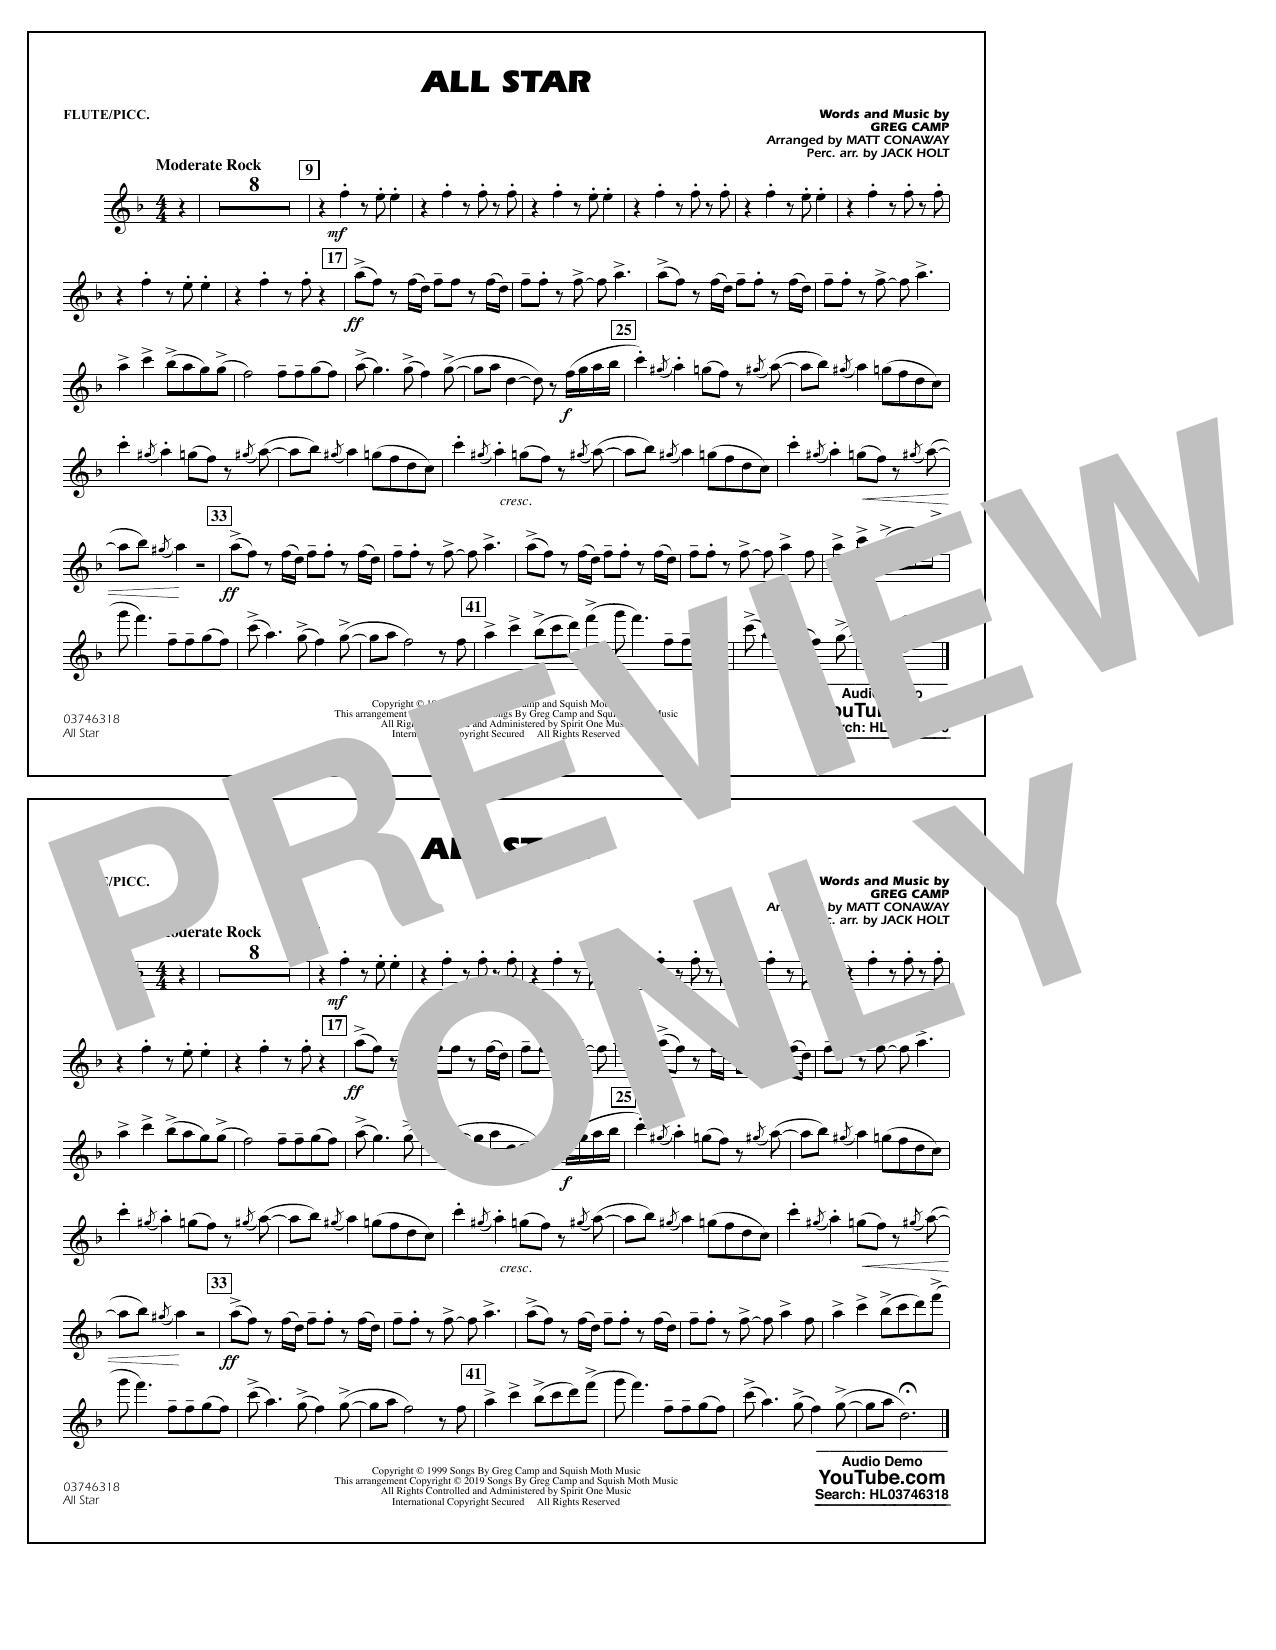 All Star (arr. Matt Conaway) - Flute/Piccolo (Marching Band)